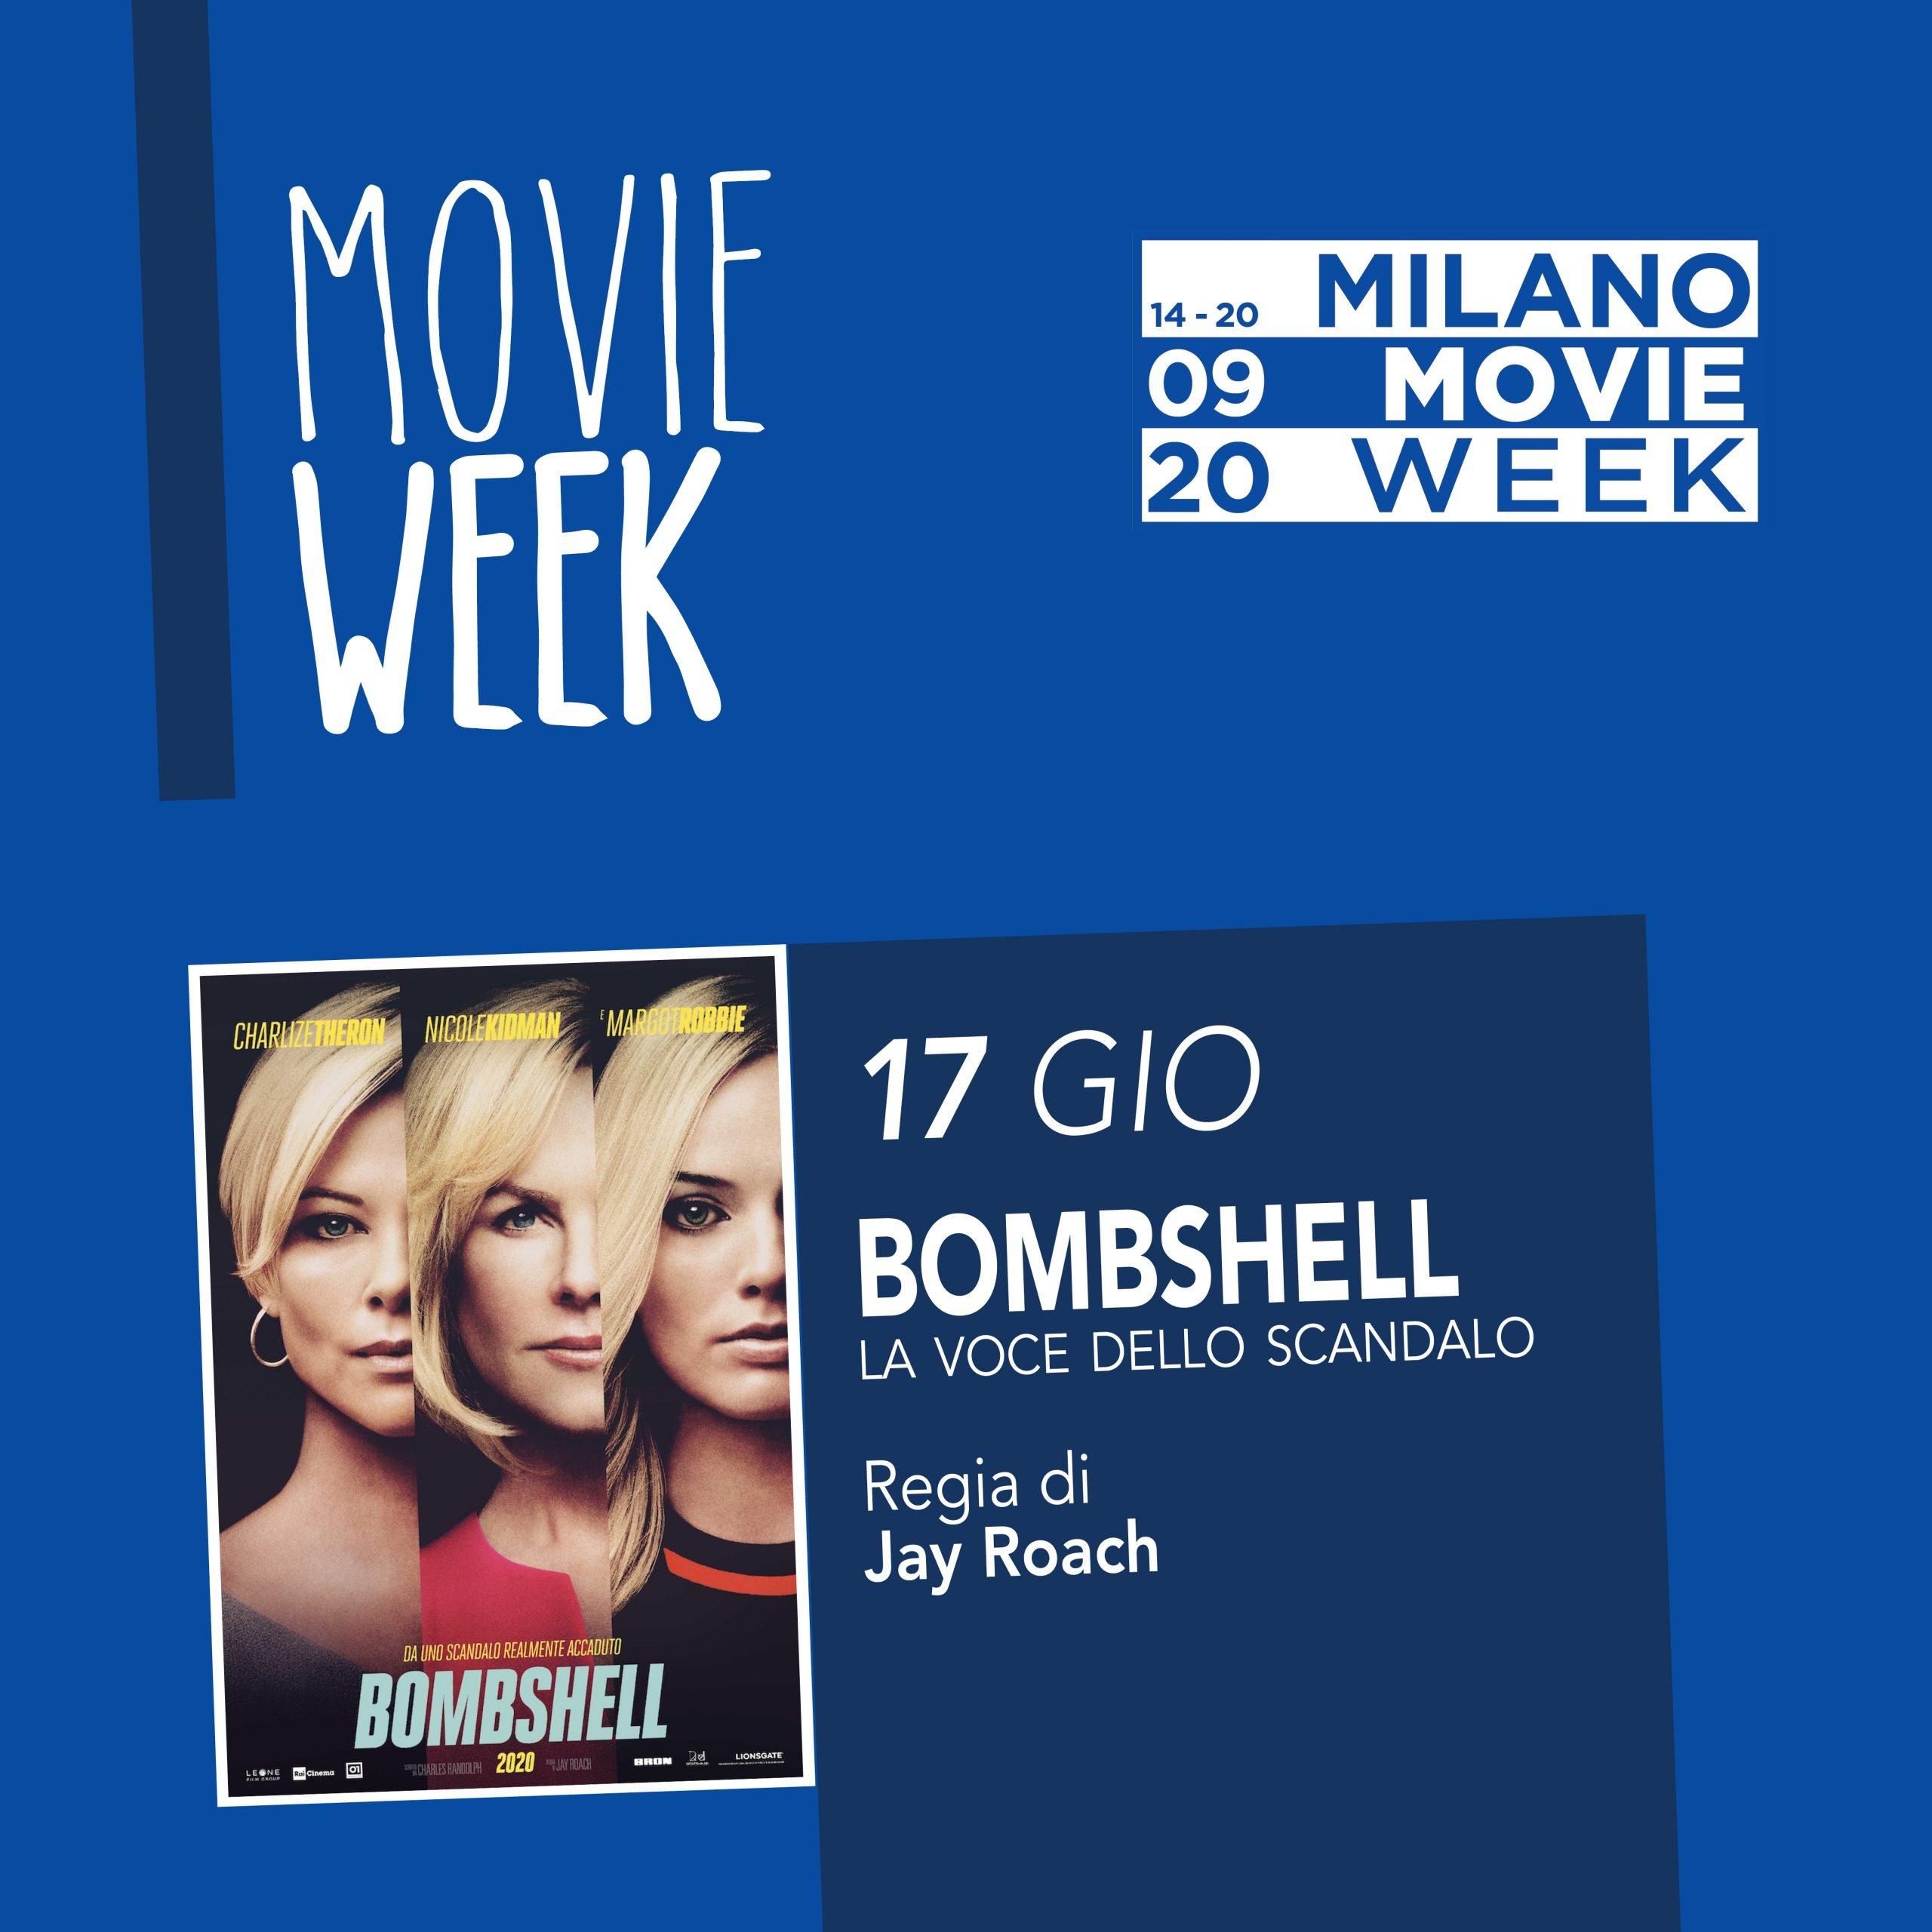 Movie Week Bombshell. Proiezione al Centro Asteria